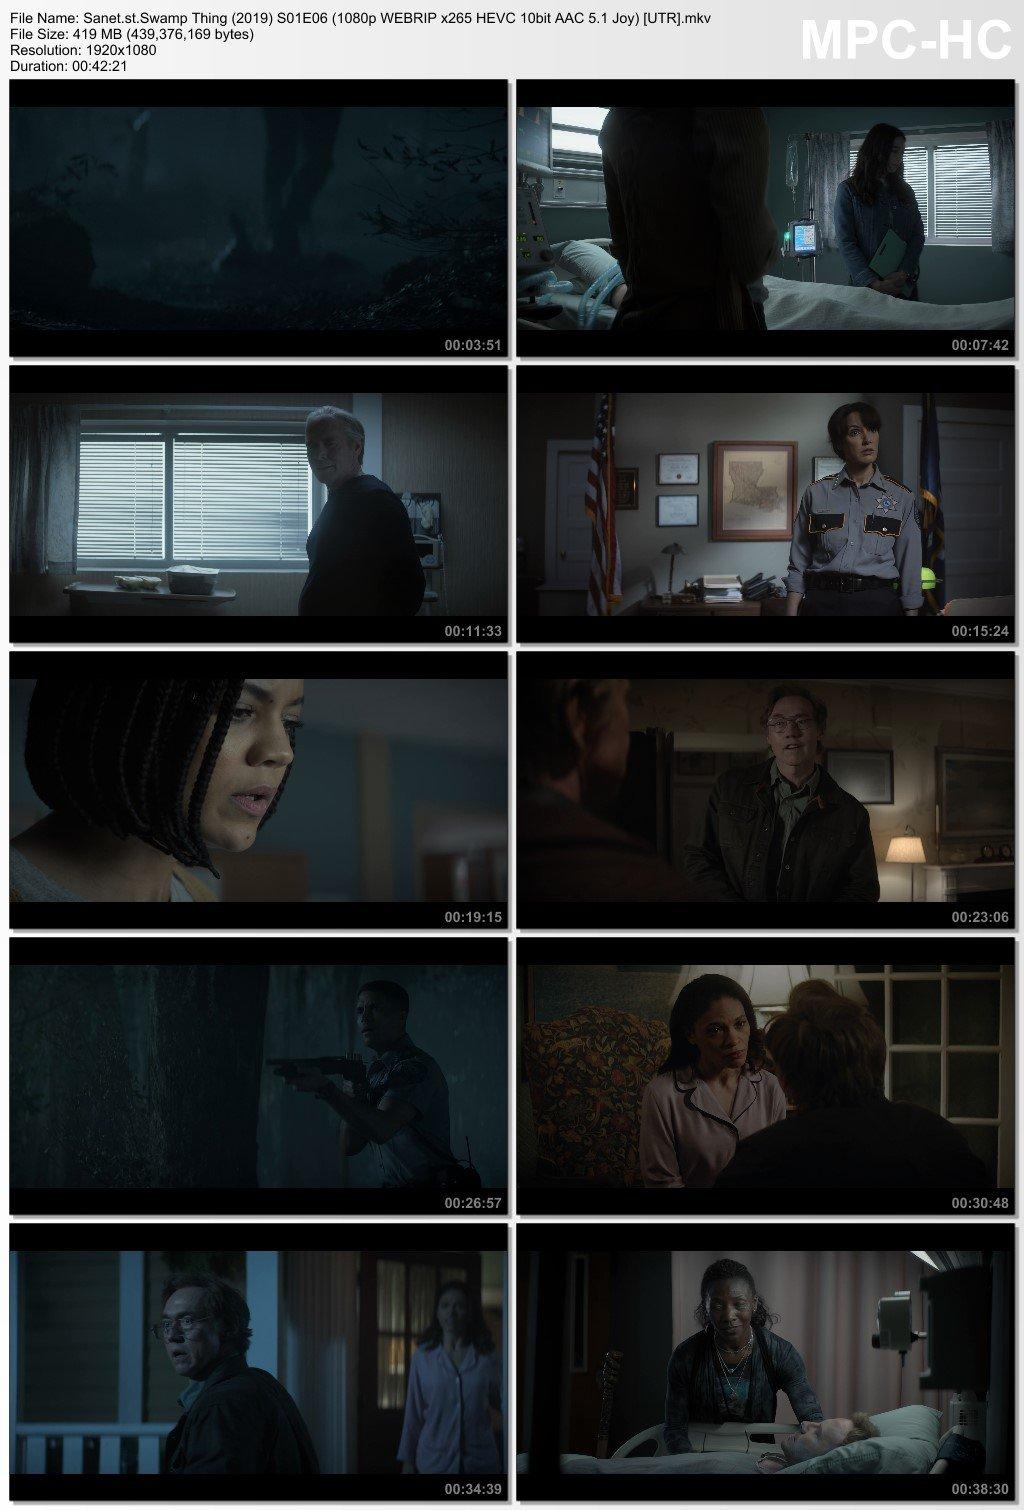 Download Swamp Thing 2019 S01E06 1080p WEBRIP x265 HEVC 10bit AAC